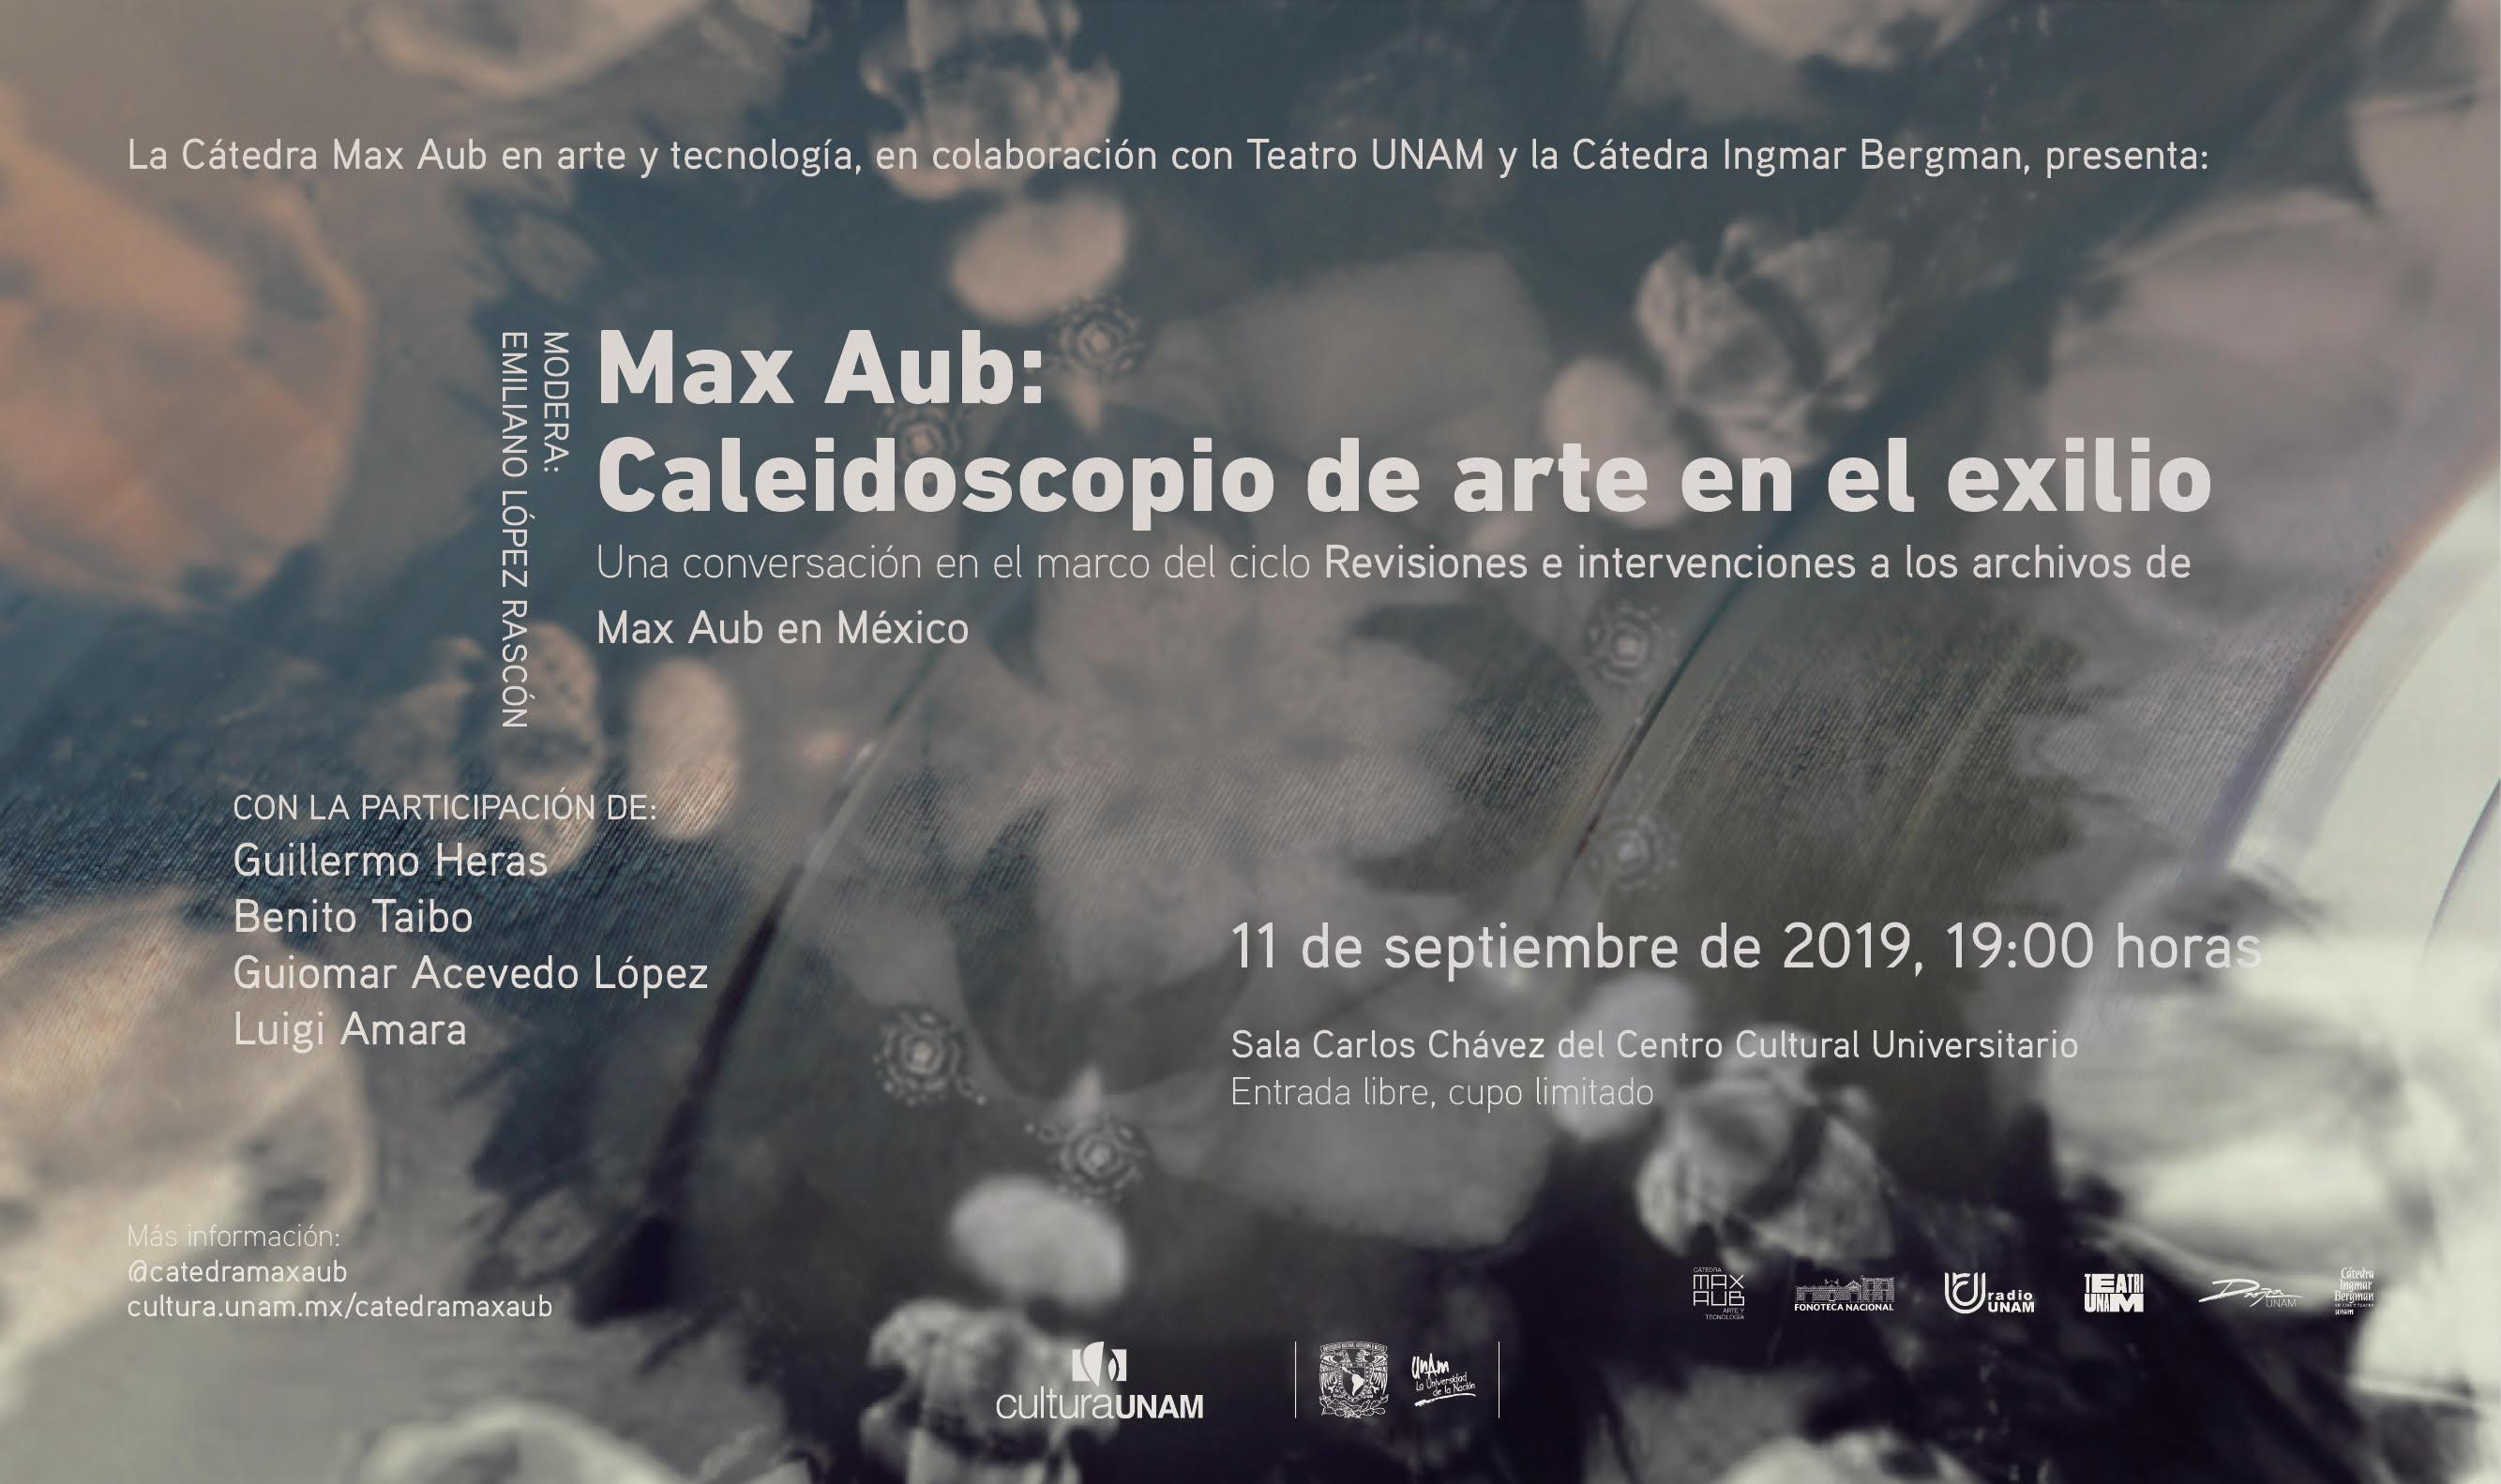 max_aub_caleidoscopio